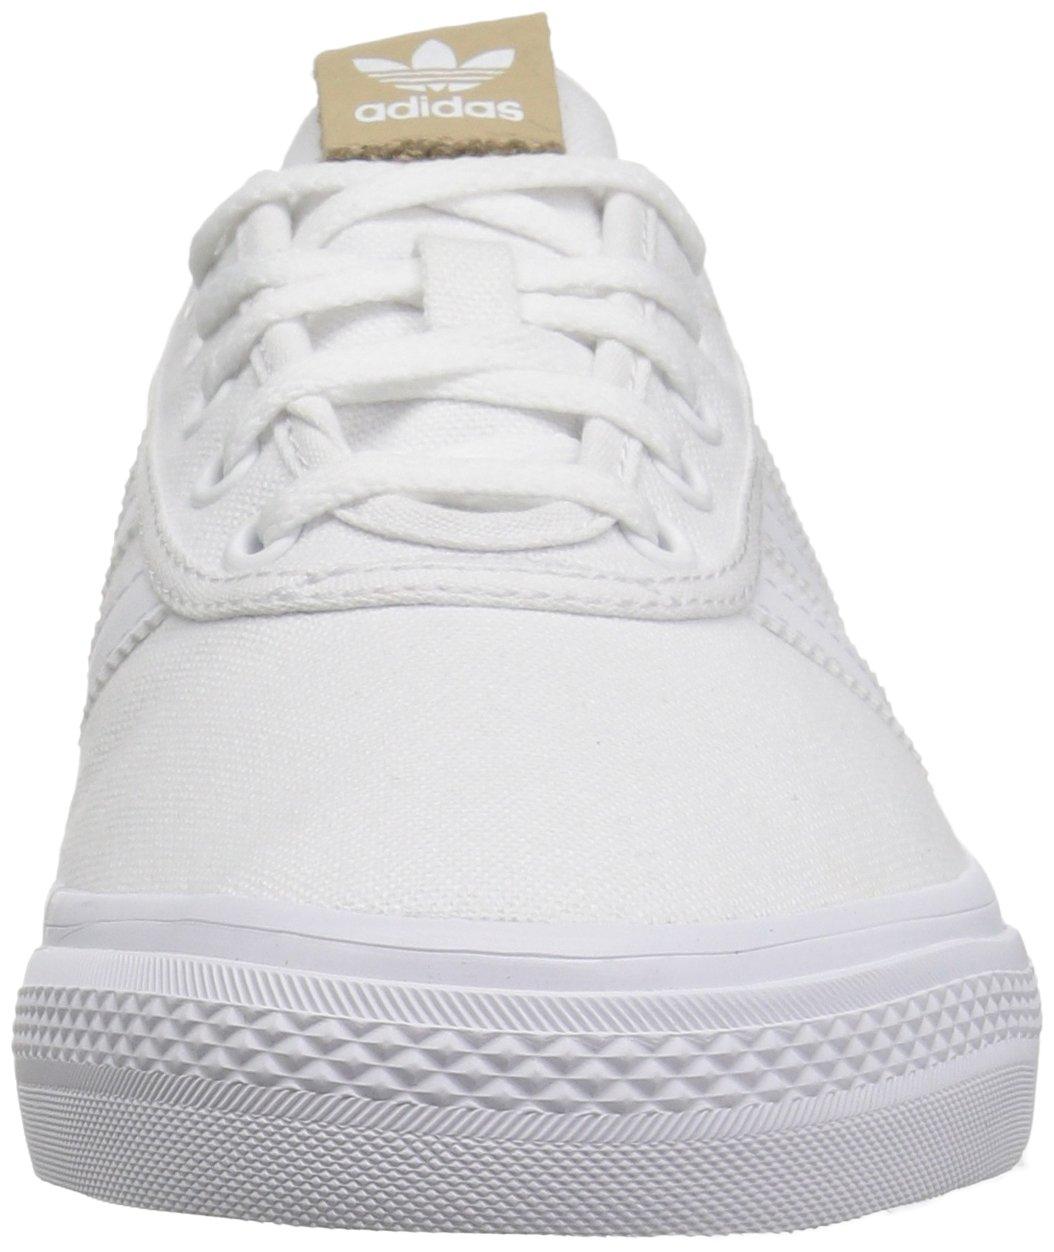 adidas Originals Women's Adiease Shoes B01N1Q9DSR (7.5 M US)|White/White/Pale Nude